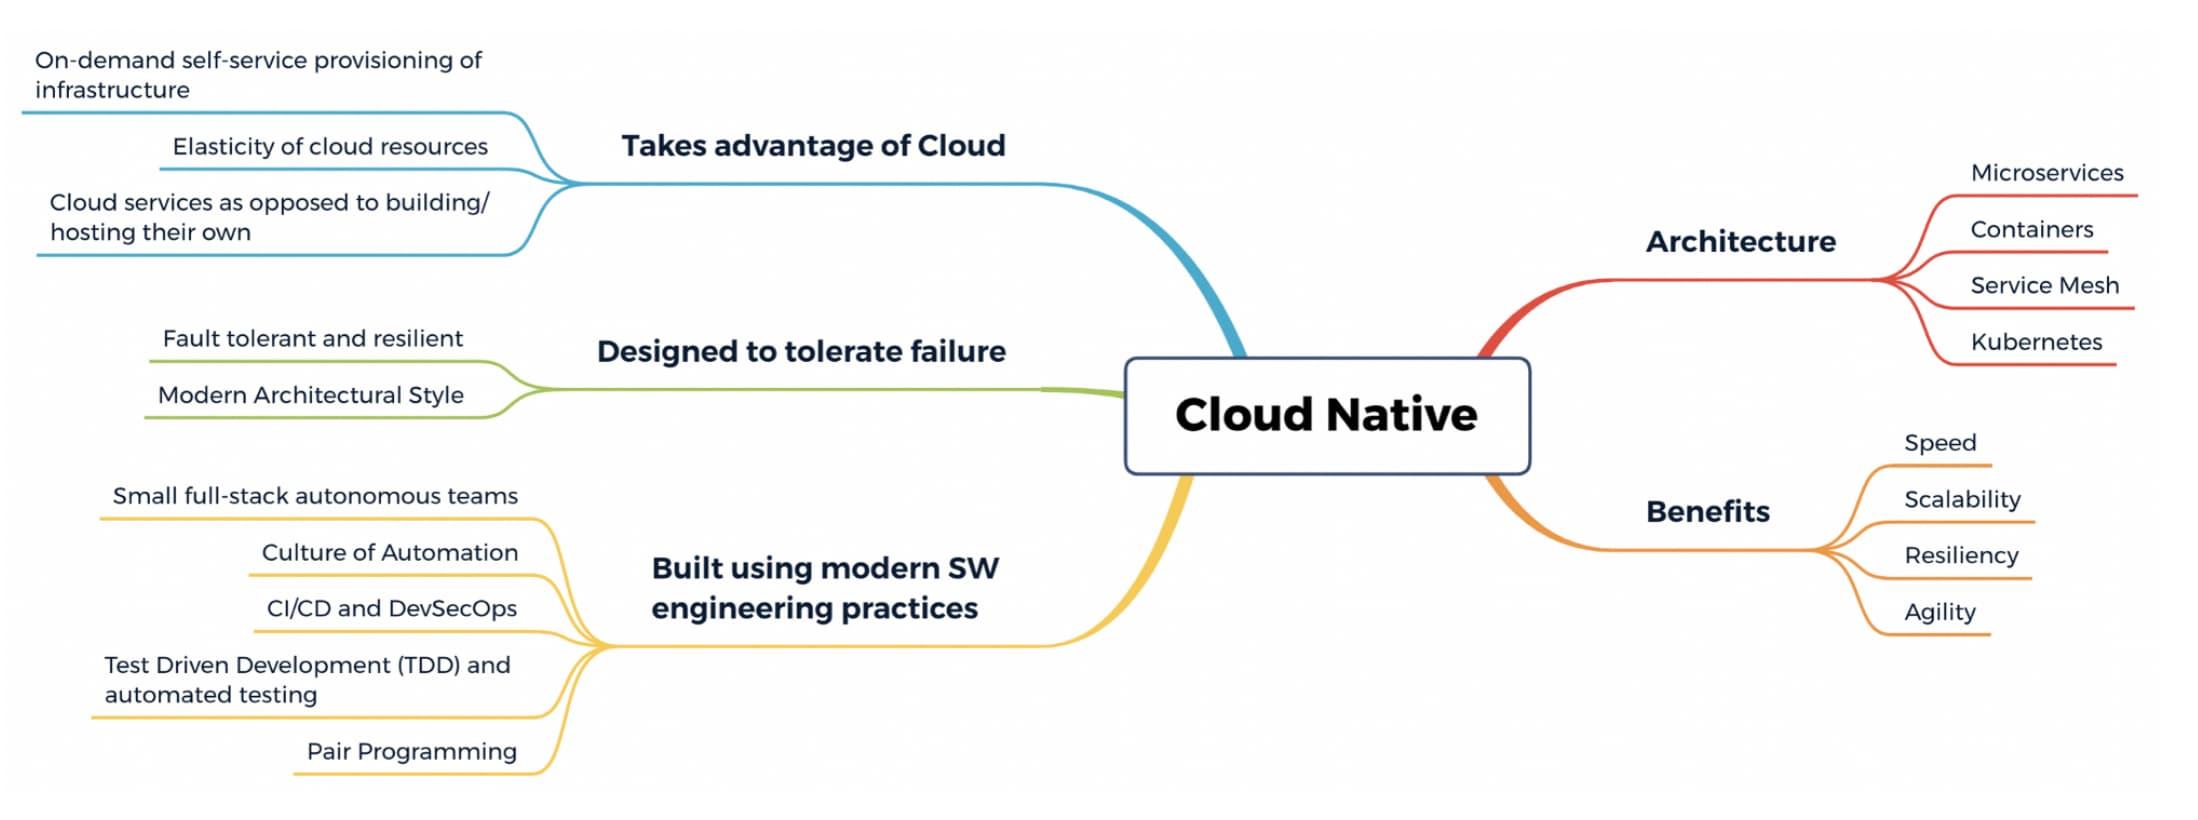 Cloud-native architecture and benefits mindmap